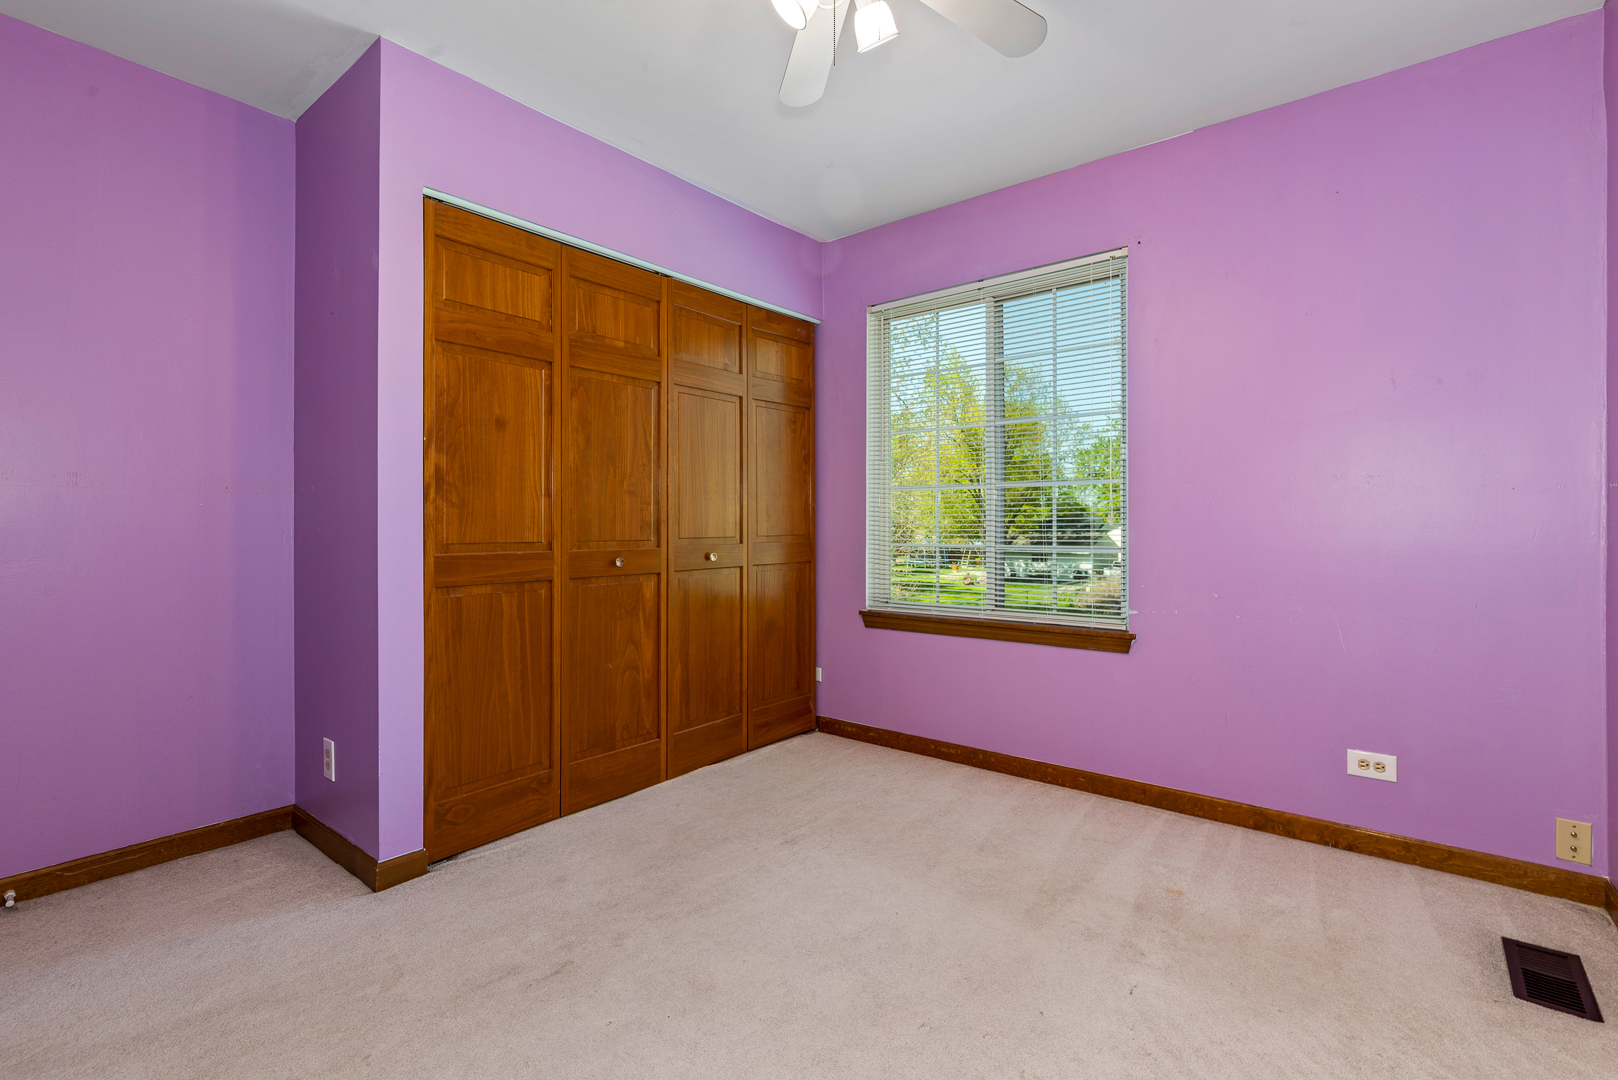 1512 Burr Oak, AURORA, Illinois, 60506